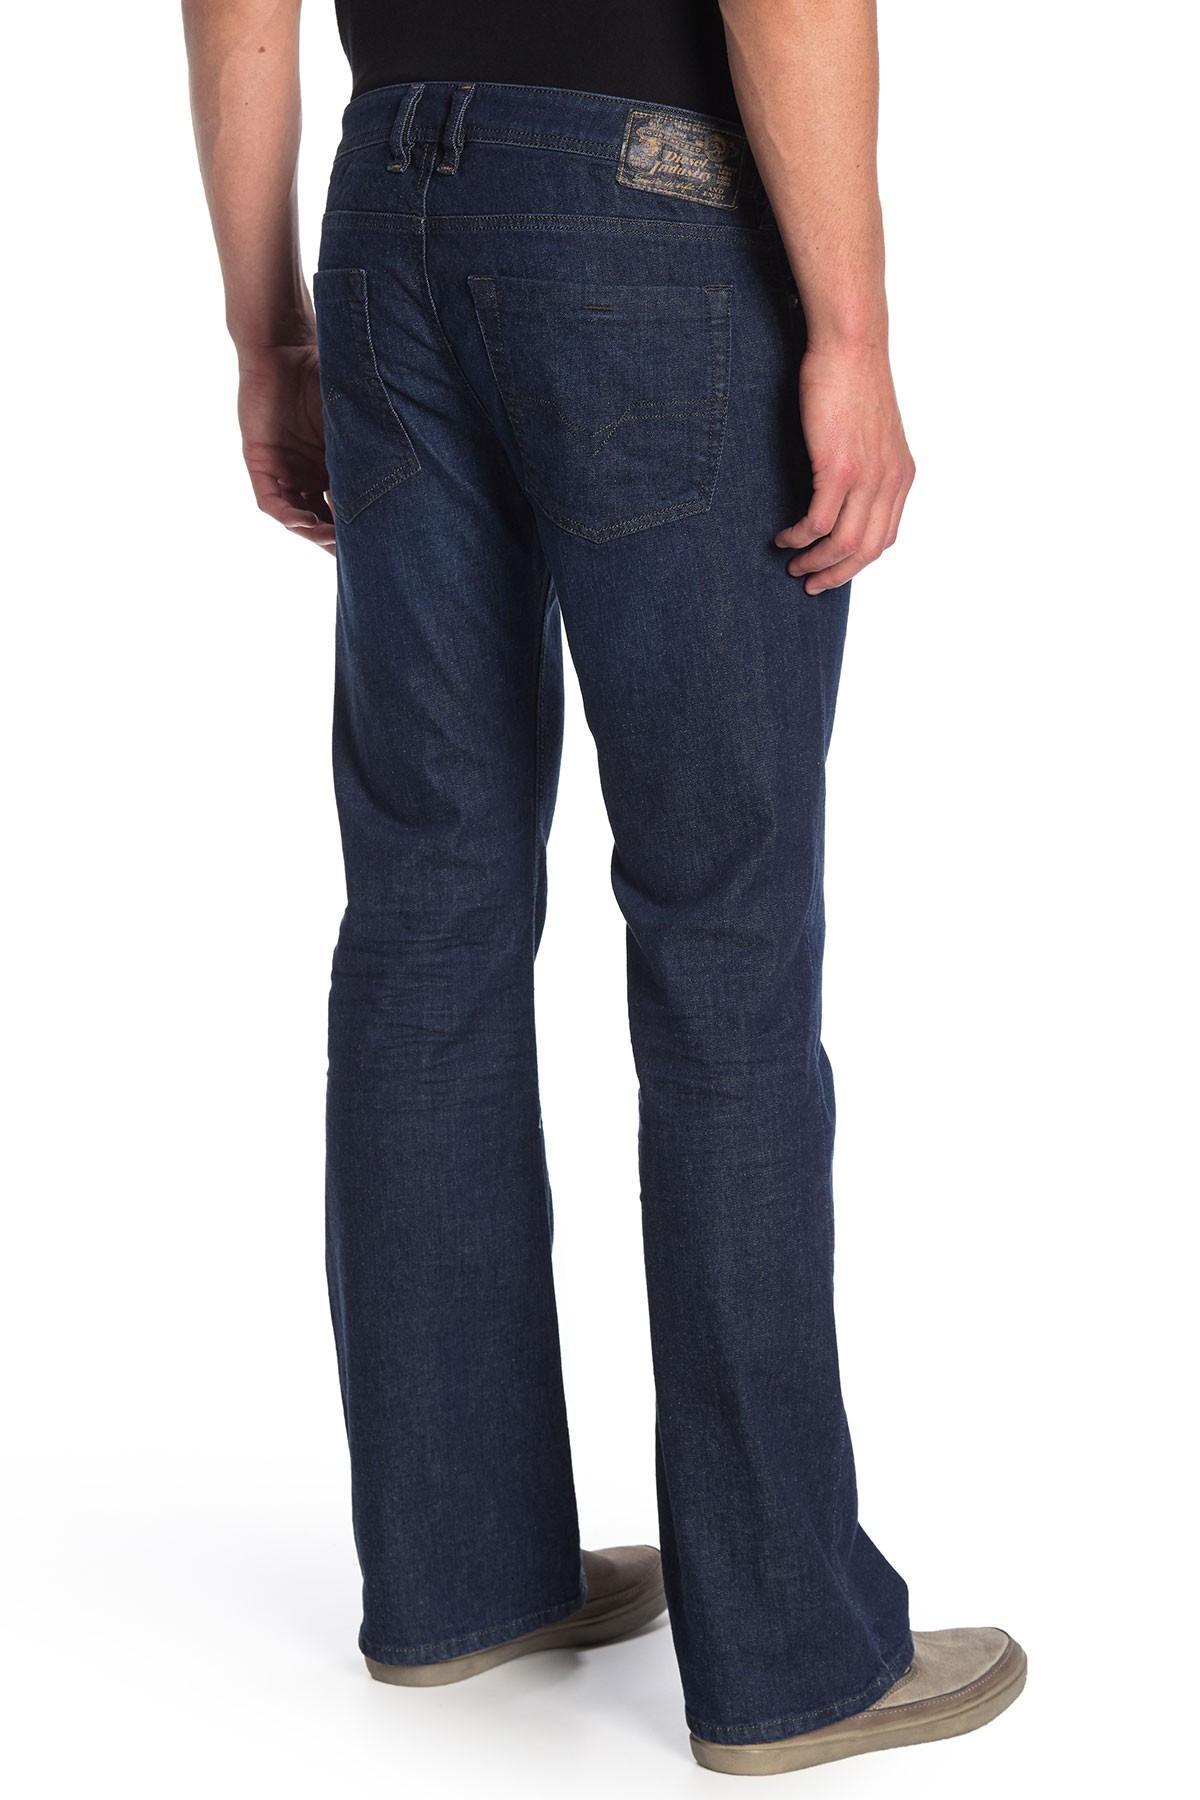 aff5827c DIESEL - Blue Zathan Bootcut Jeans for Men - Lyst. View fullscreen